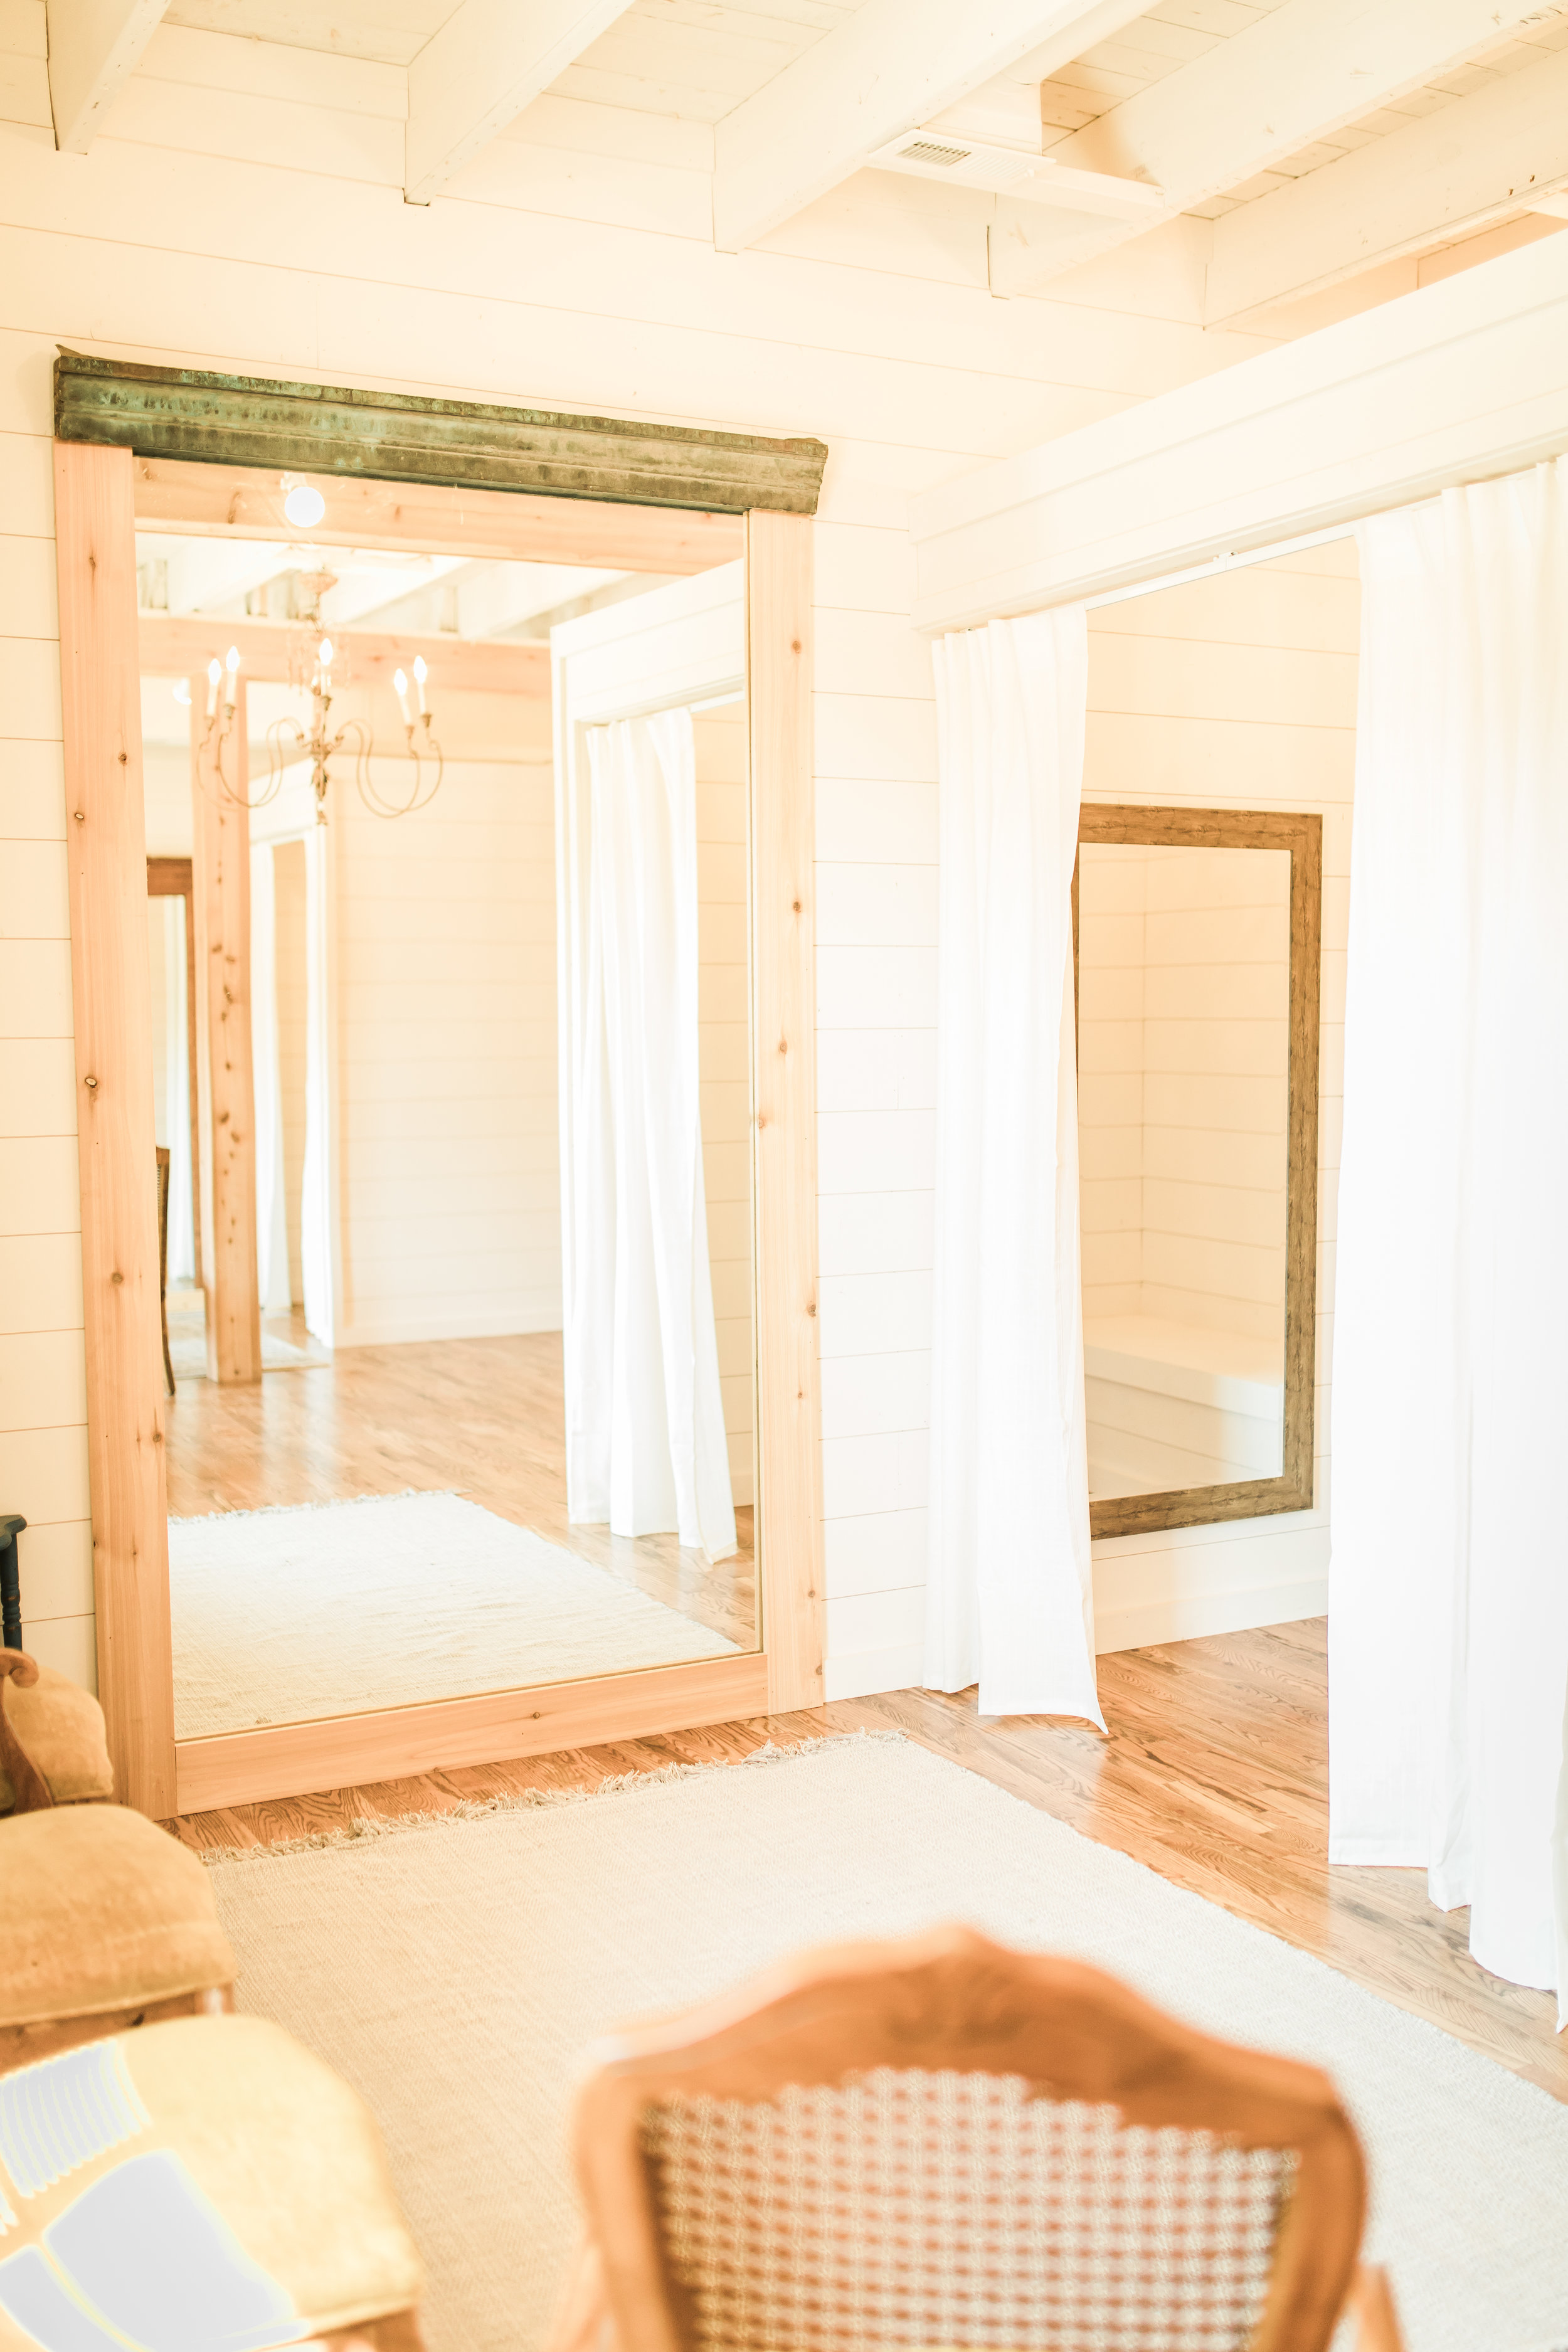 Cleo Bridal   White Traditions Sister-Store  O'Fallon, MO  Bridal Shop  Allison Slater Photography68.jpg